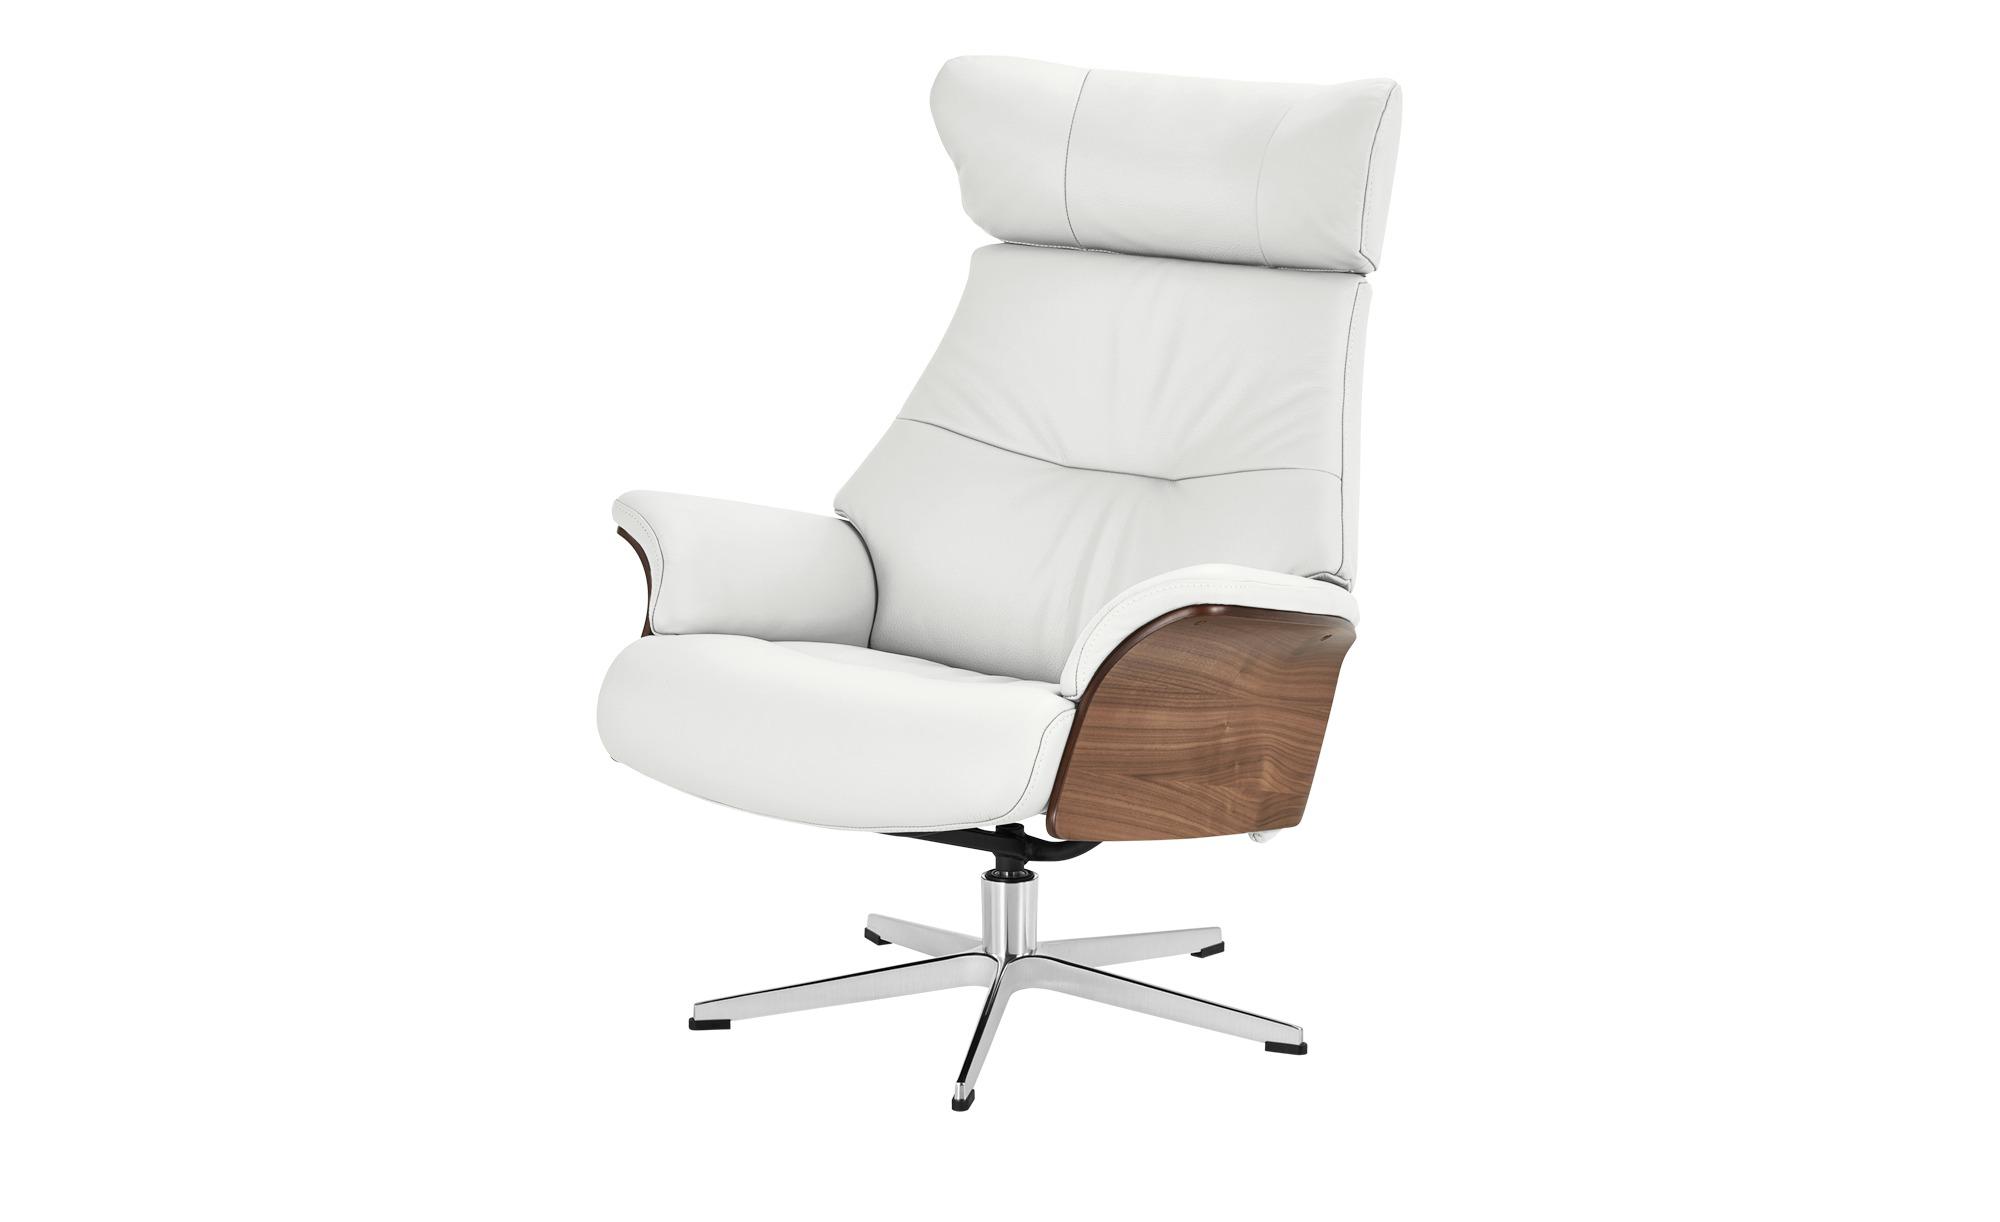 Relaxsessel weiß - Leder Air ¦ weiß ¦ Maße (cm): B: 80 H: 101 T: 78 Polstermöbel > Sessel > Fernsehsessel - Höffner